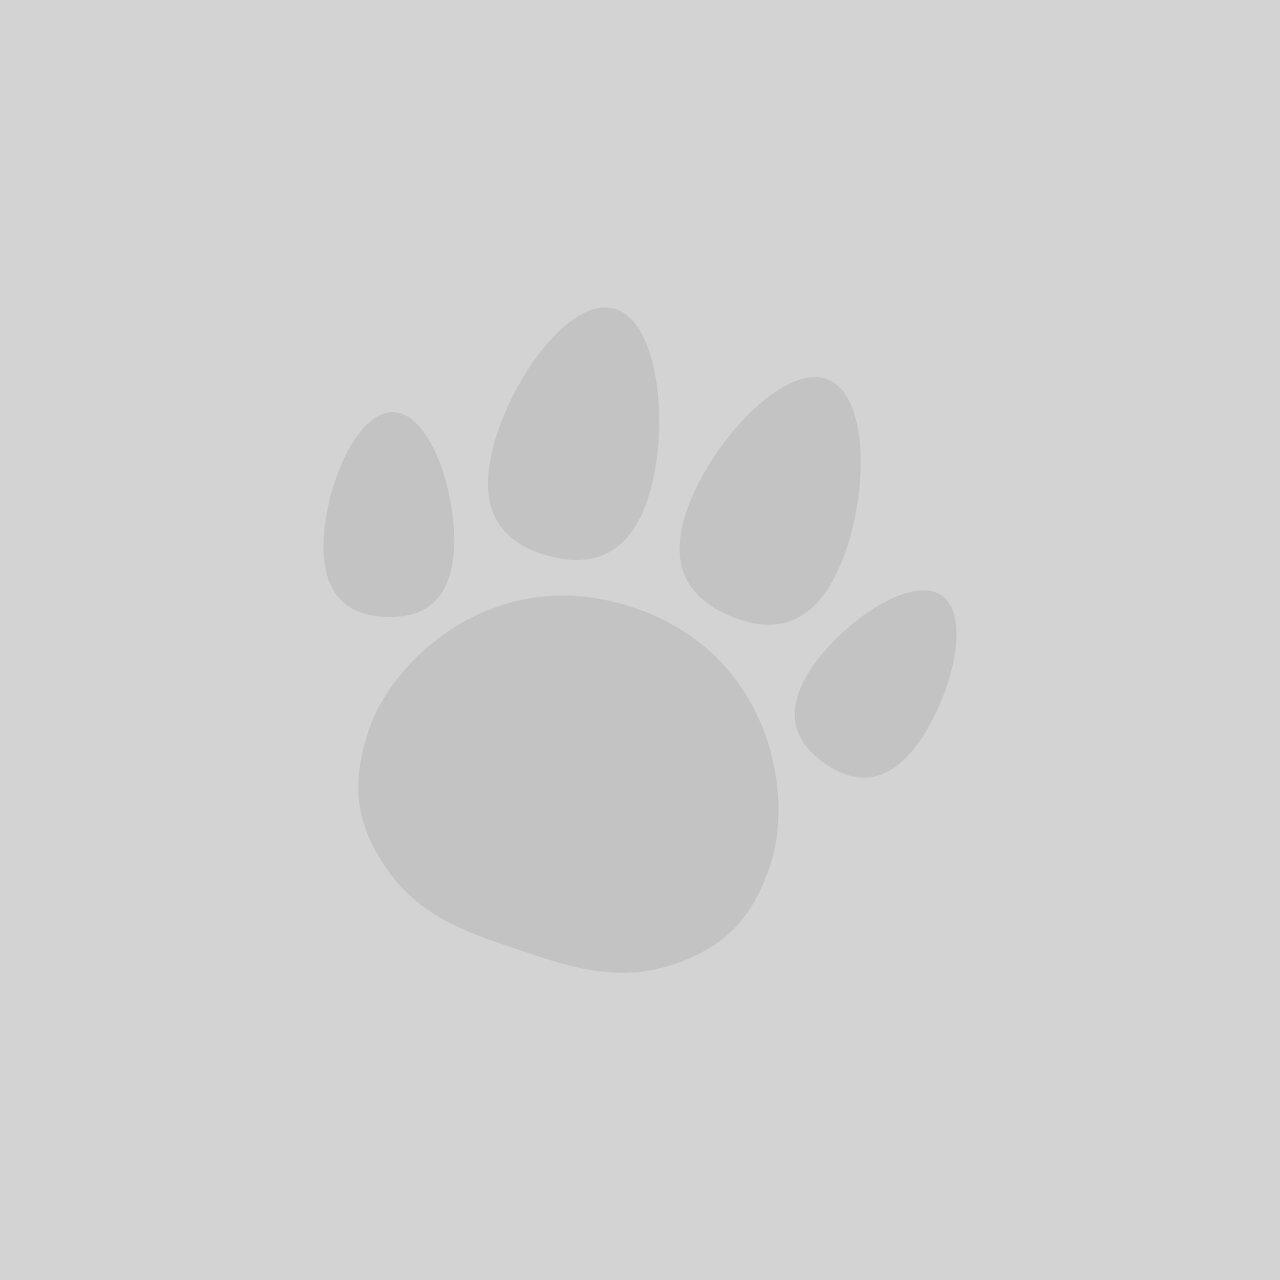 Iams Dog Food Nutrition Facts